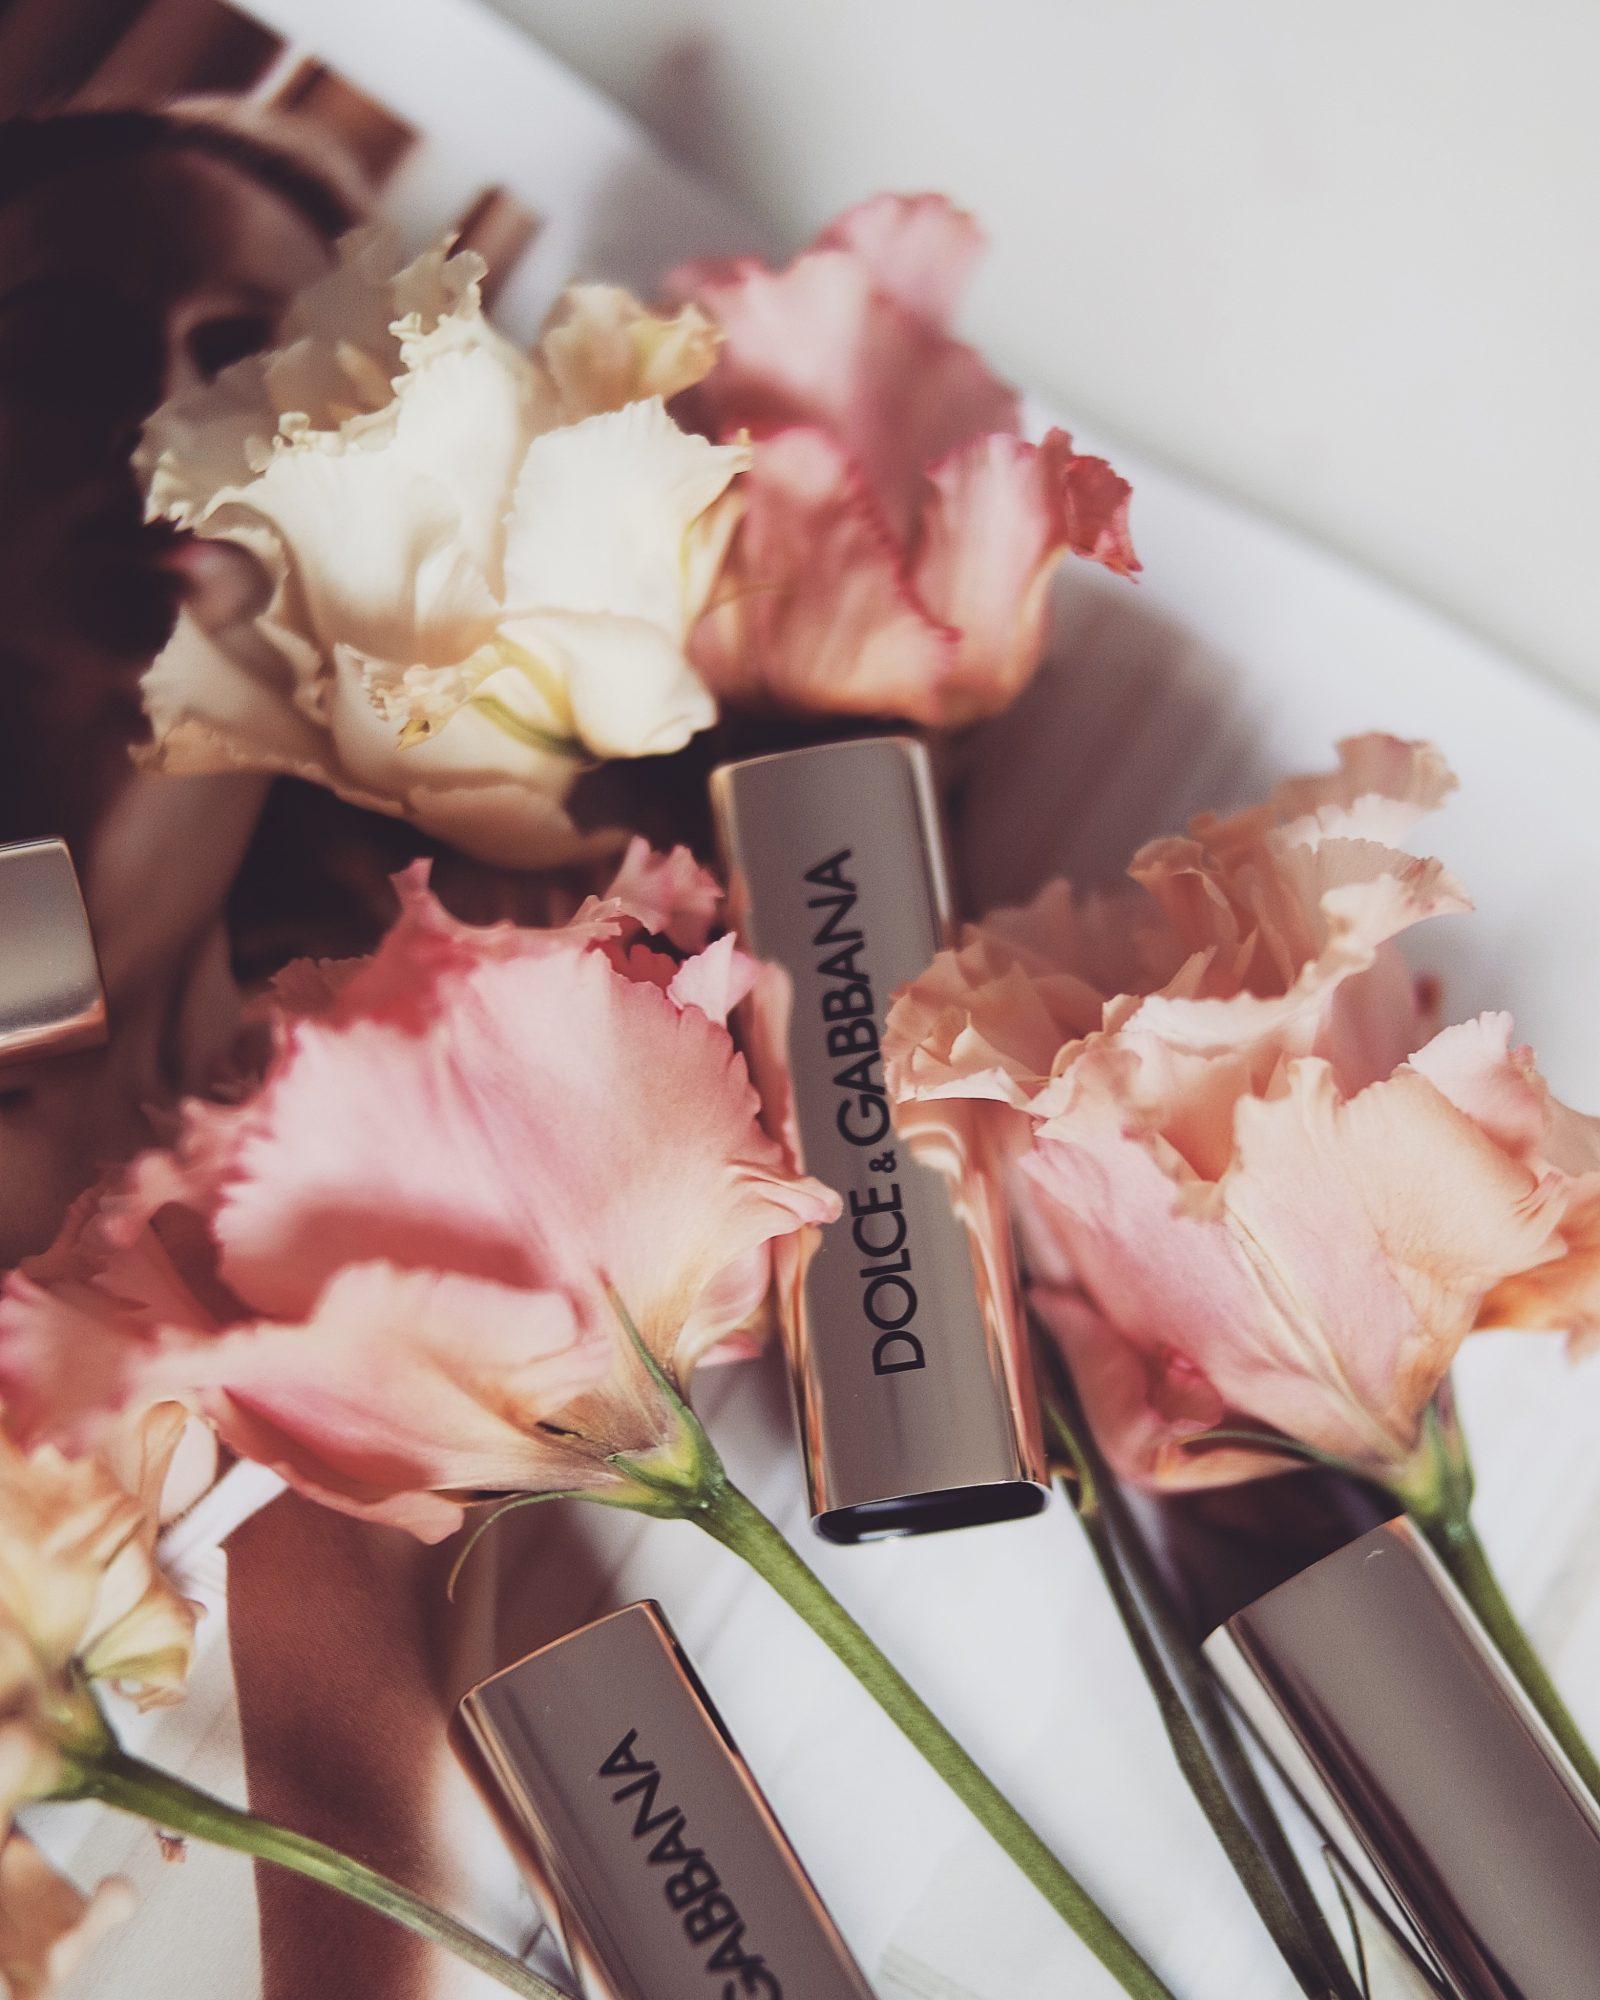 Dolce & Gabbana Lipstick - Miss Sicily